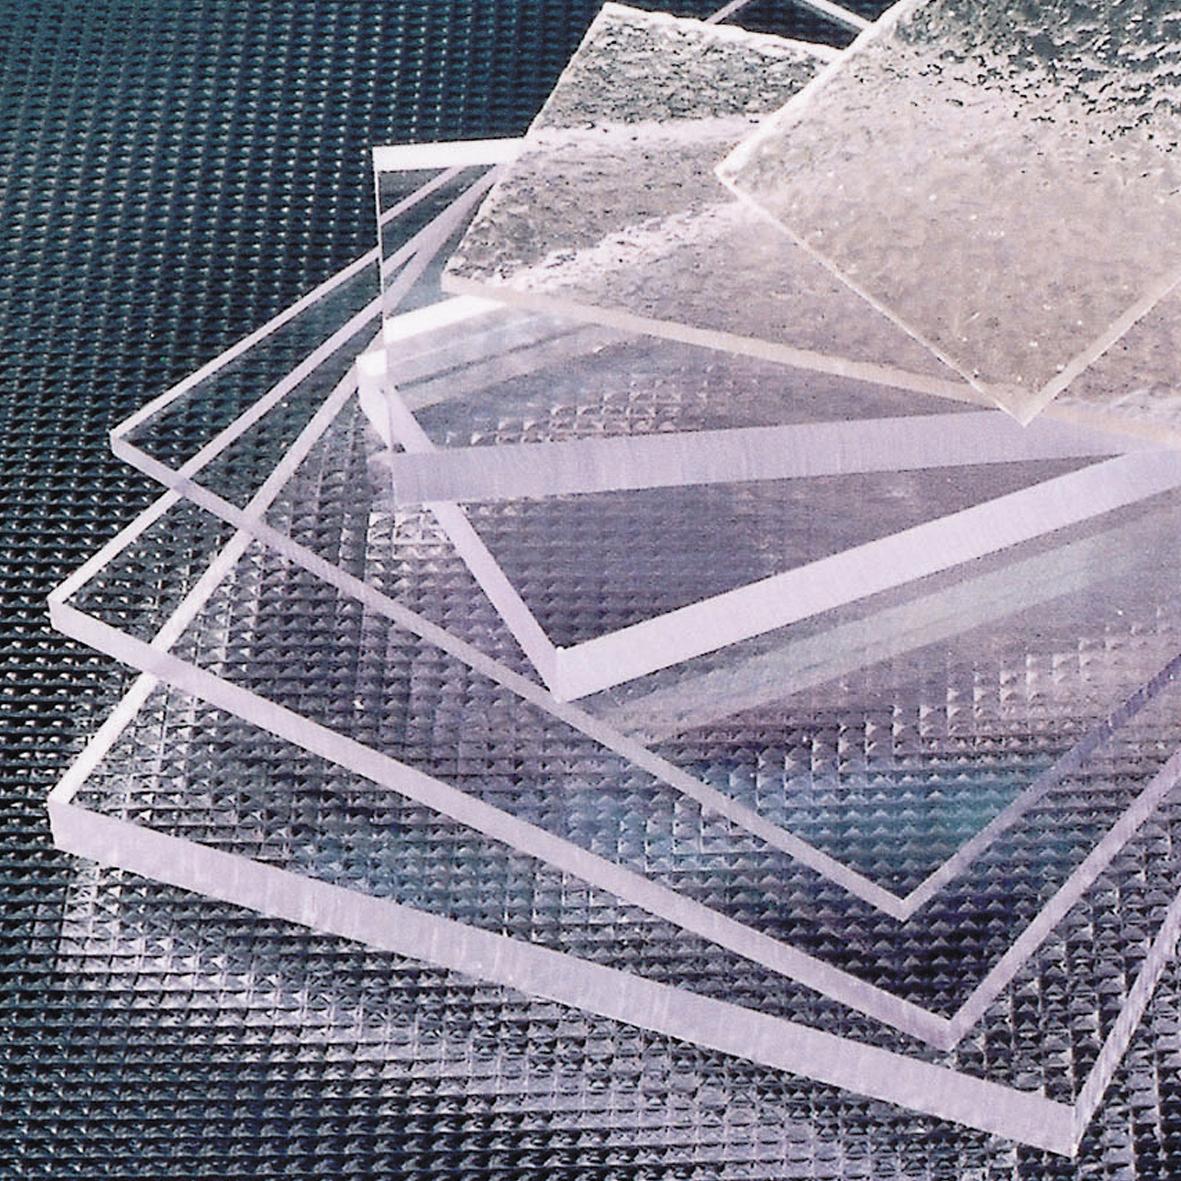 Kiowa Ltd 1250 X 2050 1mm Polycarbonate Sheet Kiowa